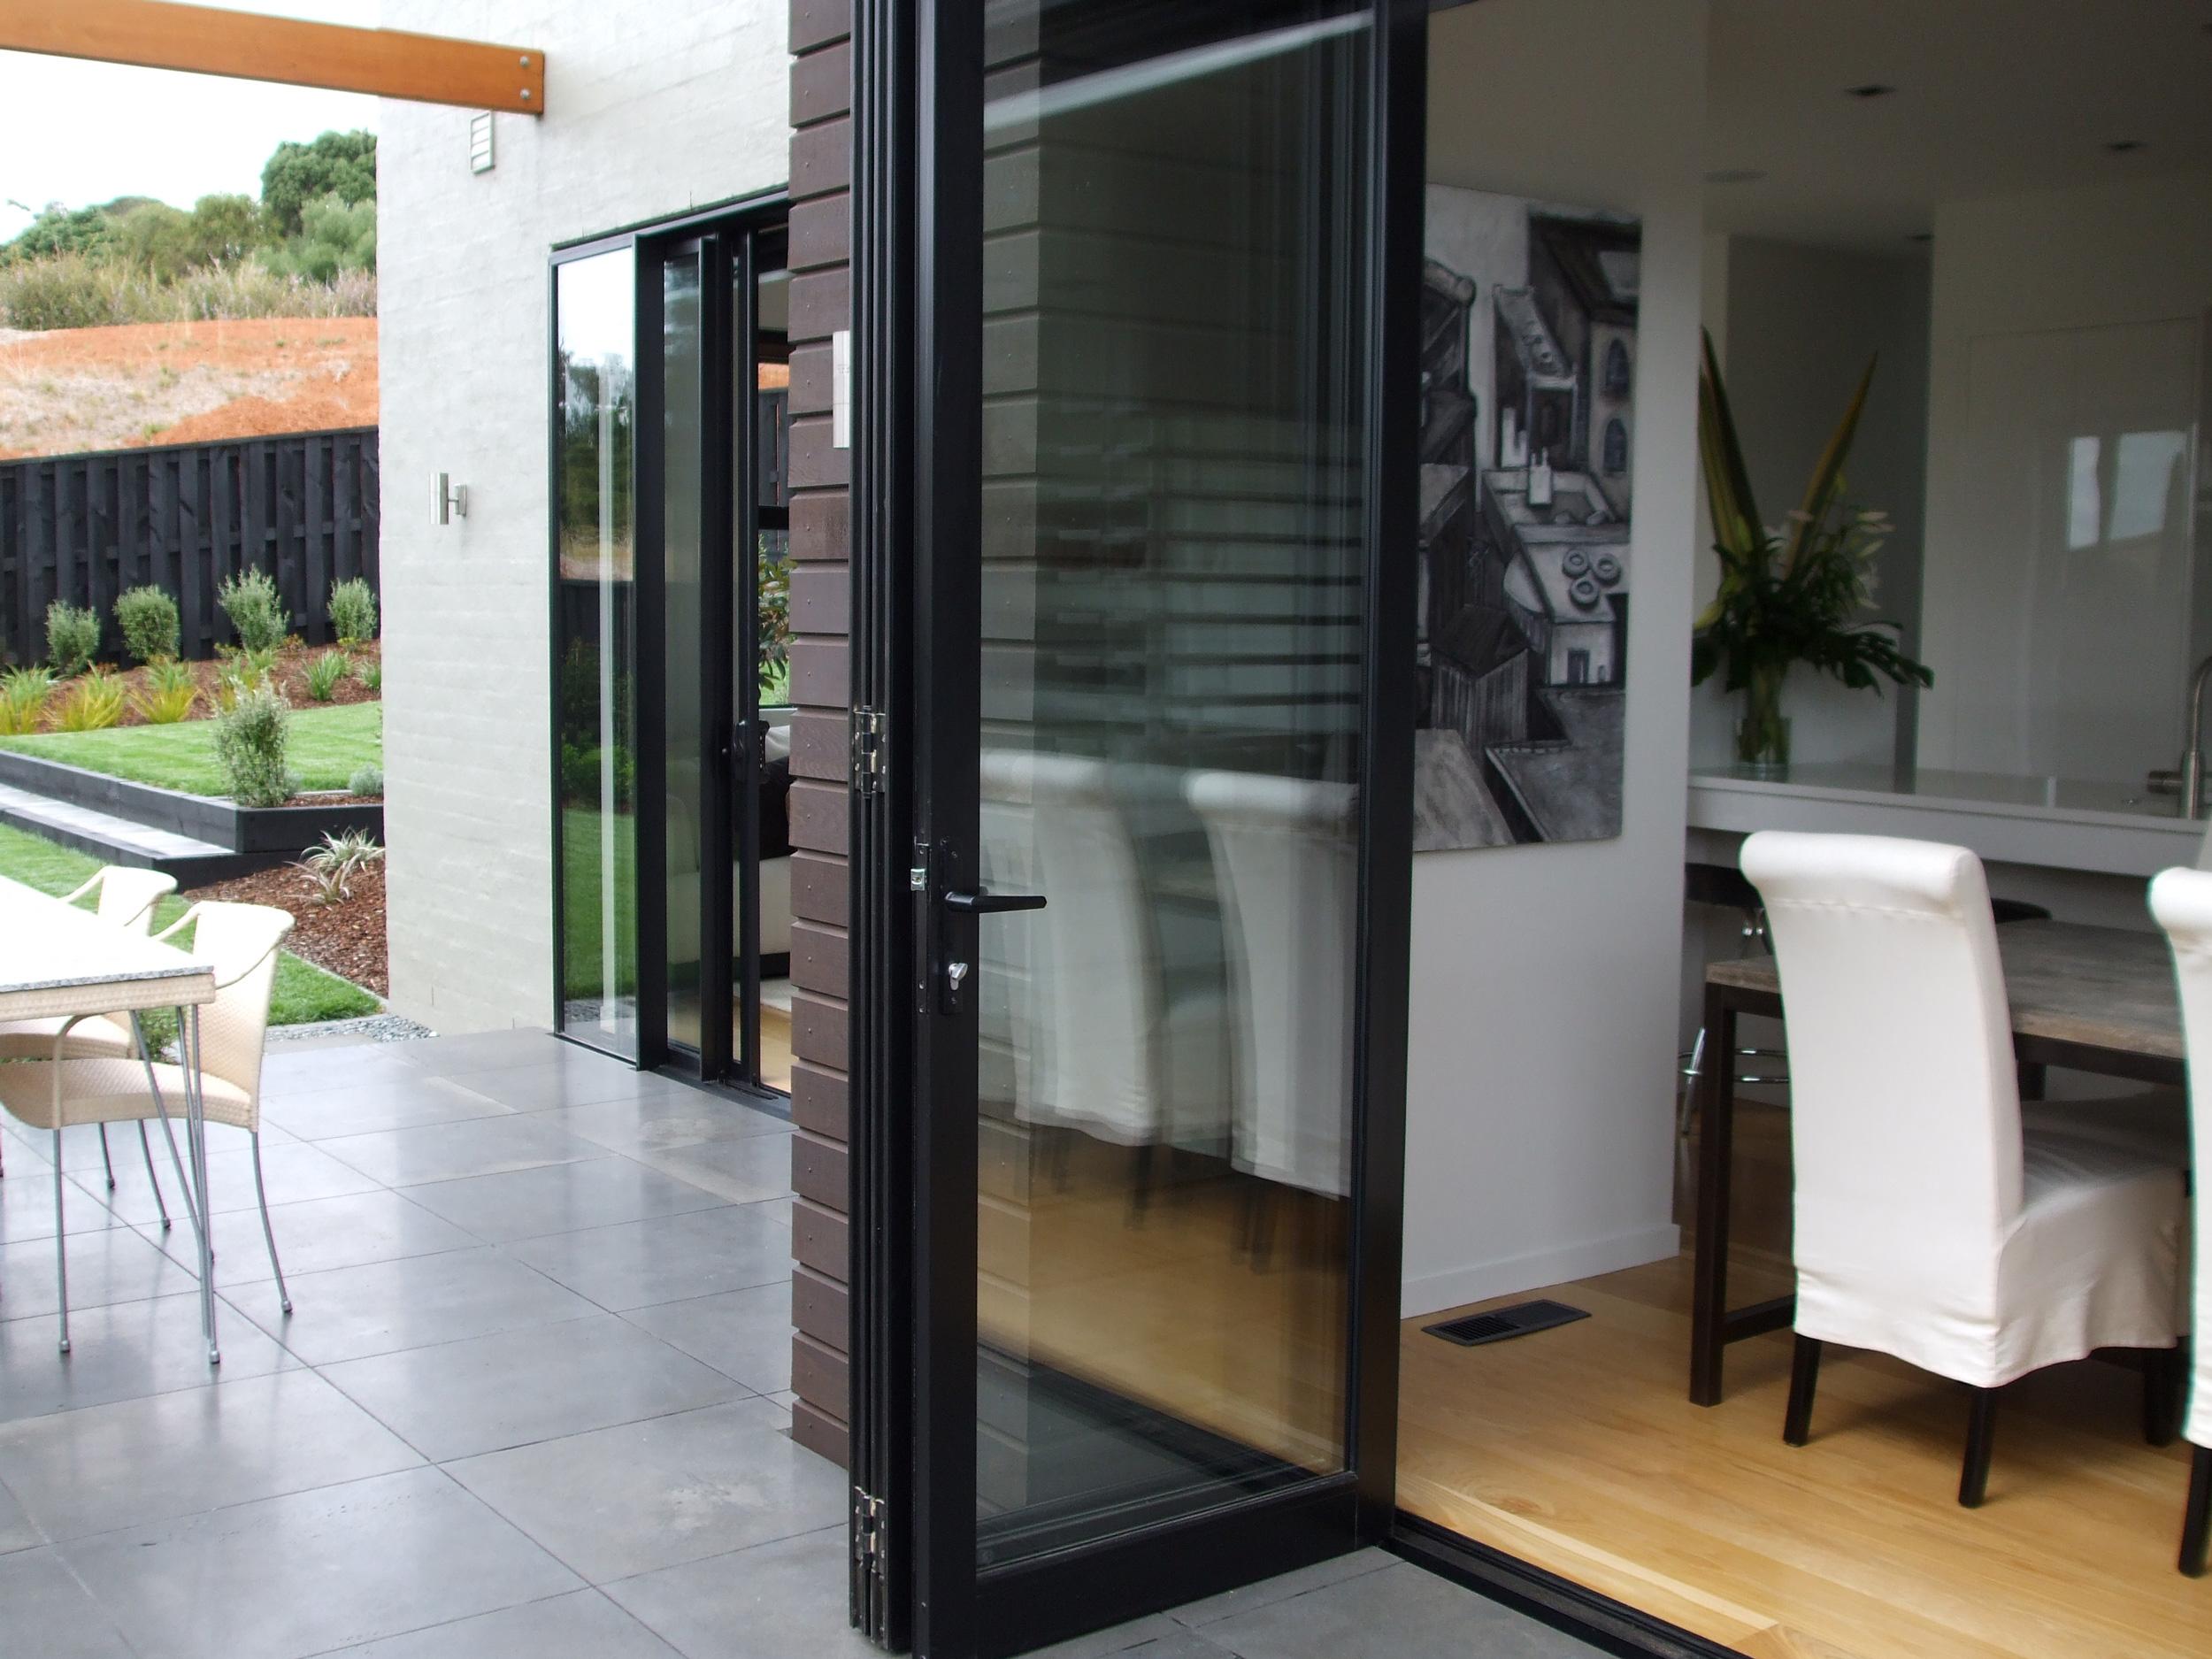 haven-builder-residential-anselmi-ridge-4.jpg